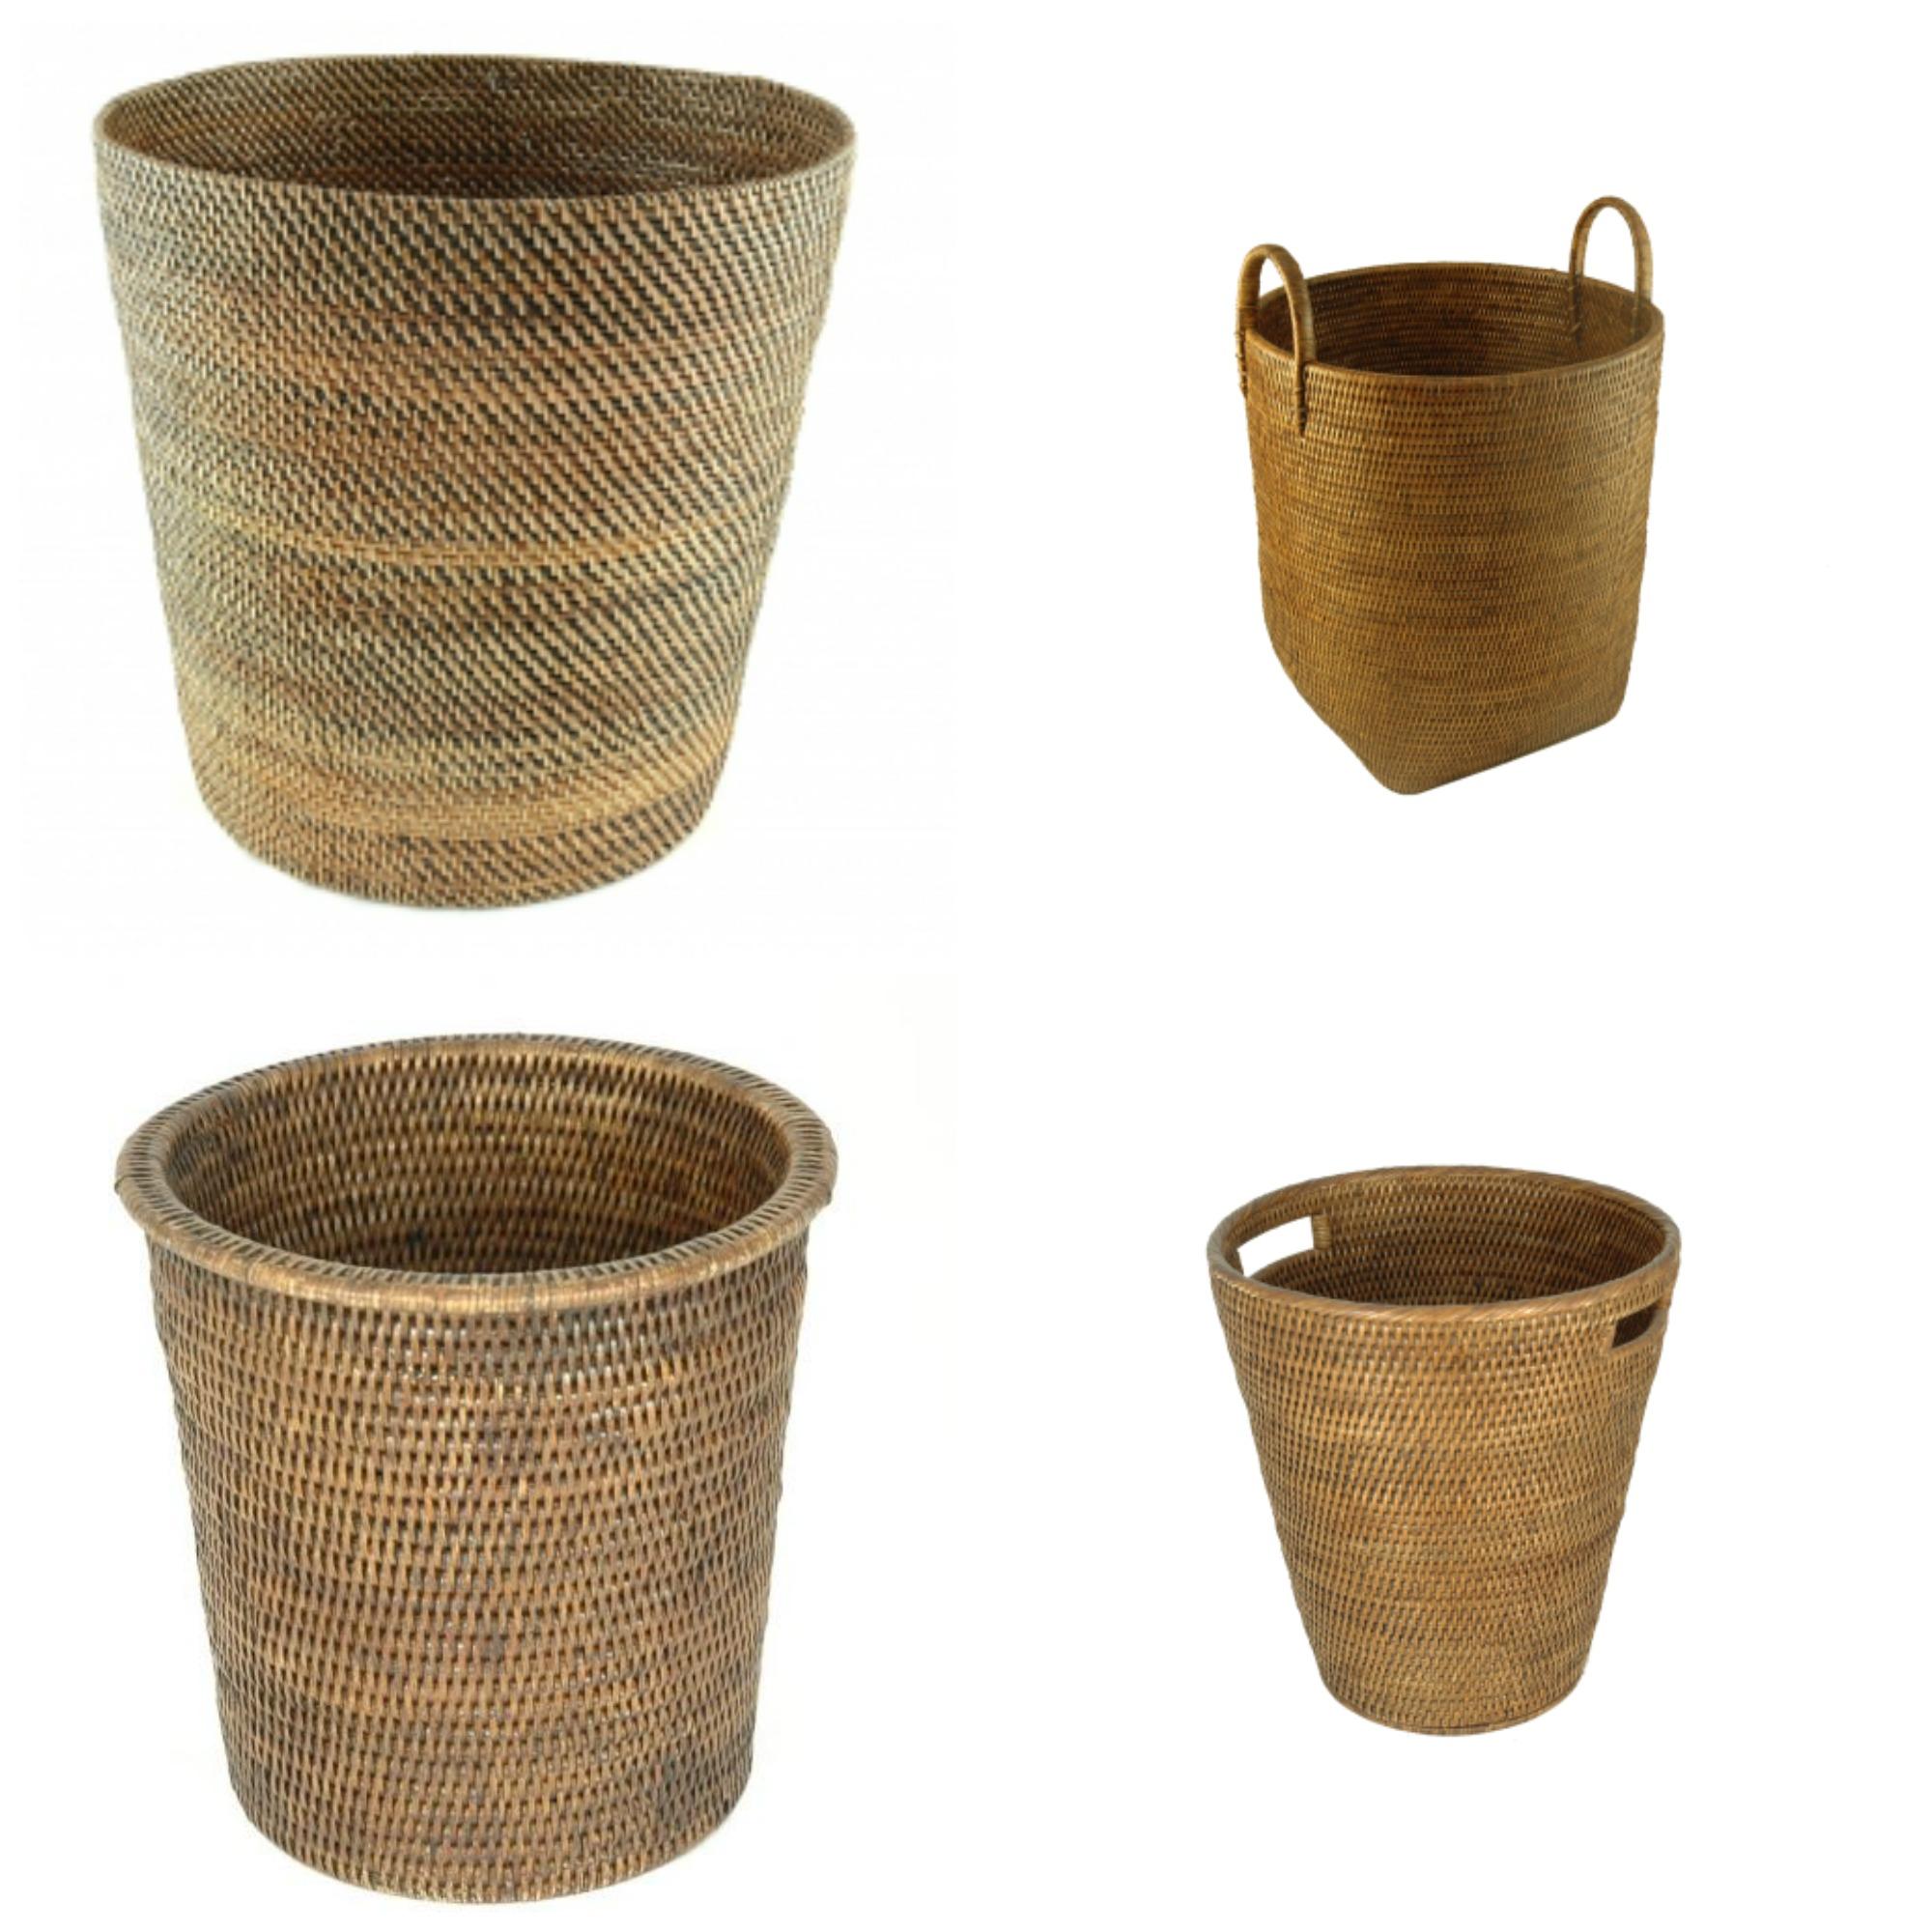 Dark Rattan Waste Paper Bins Baskets Natural Material